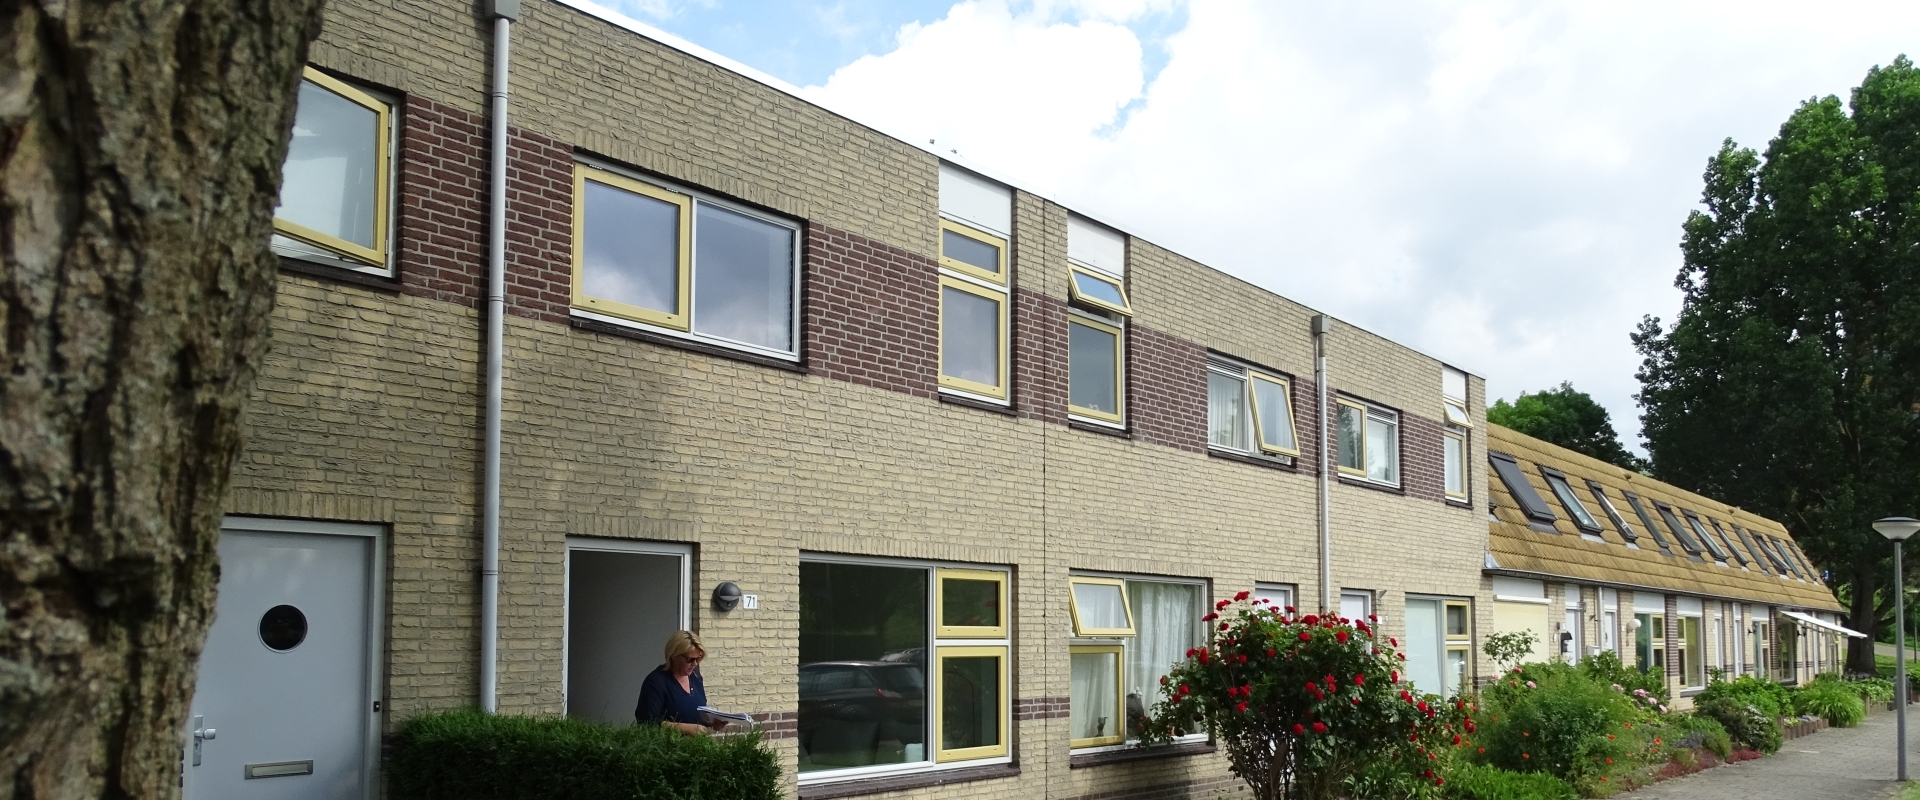 Brinkenhofsestraat, Arnhem